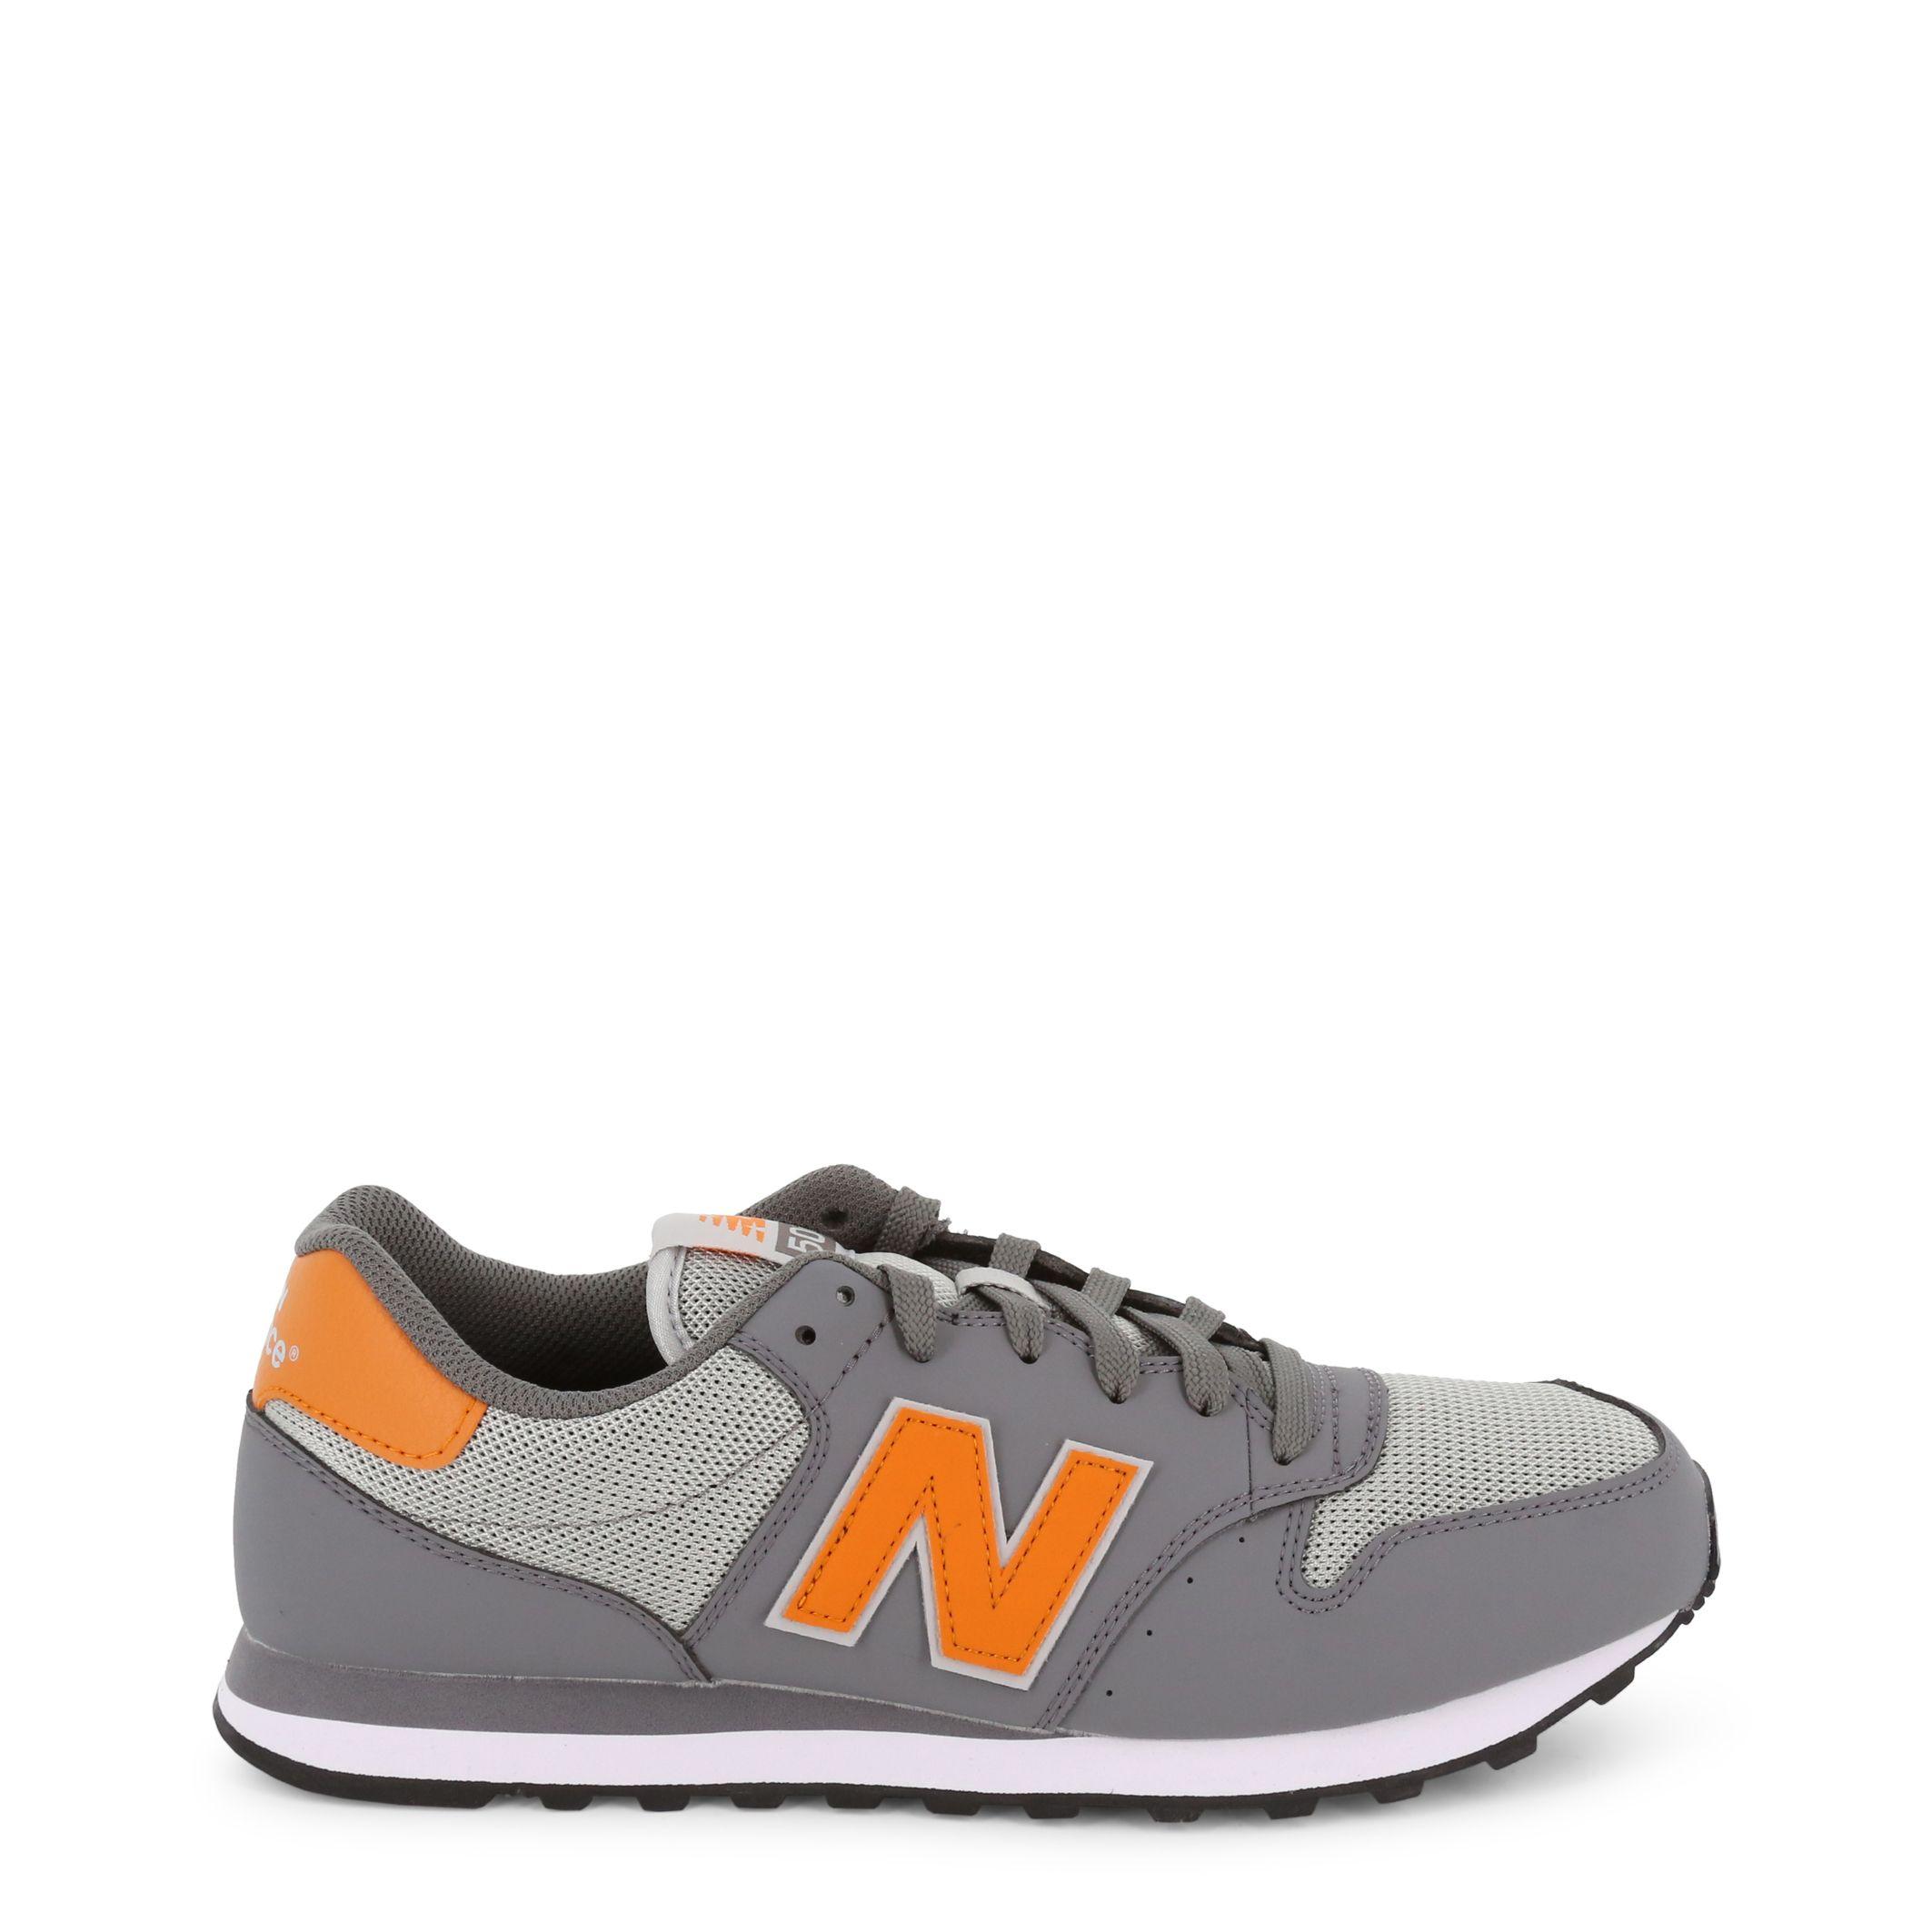 GM500 in 2020 | Sneakers men, Running shoes for men, Grey sneakers